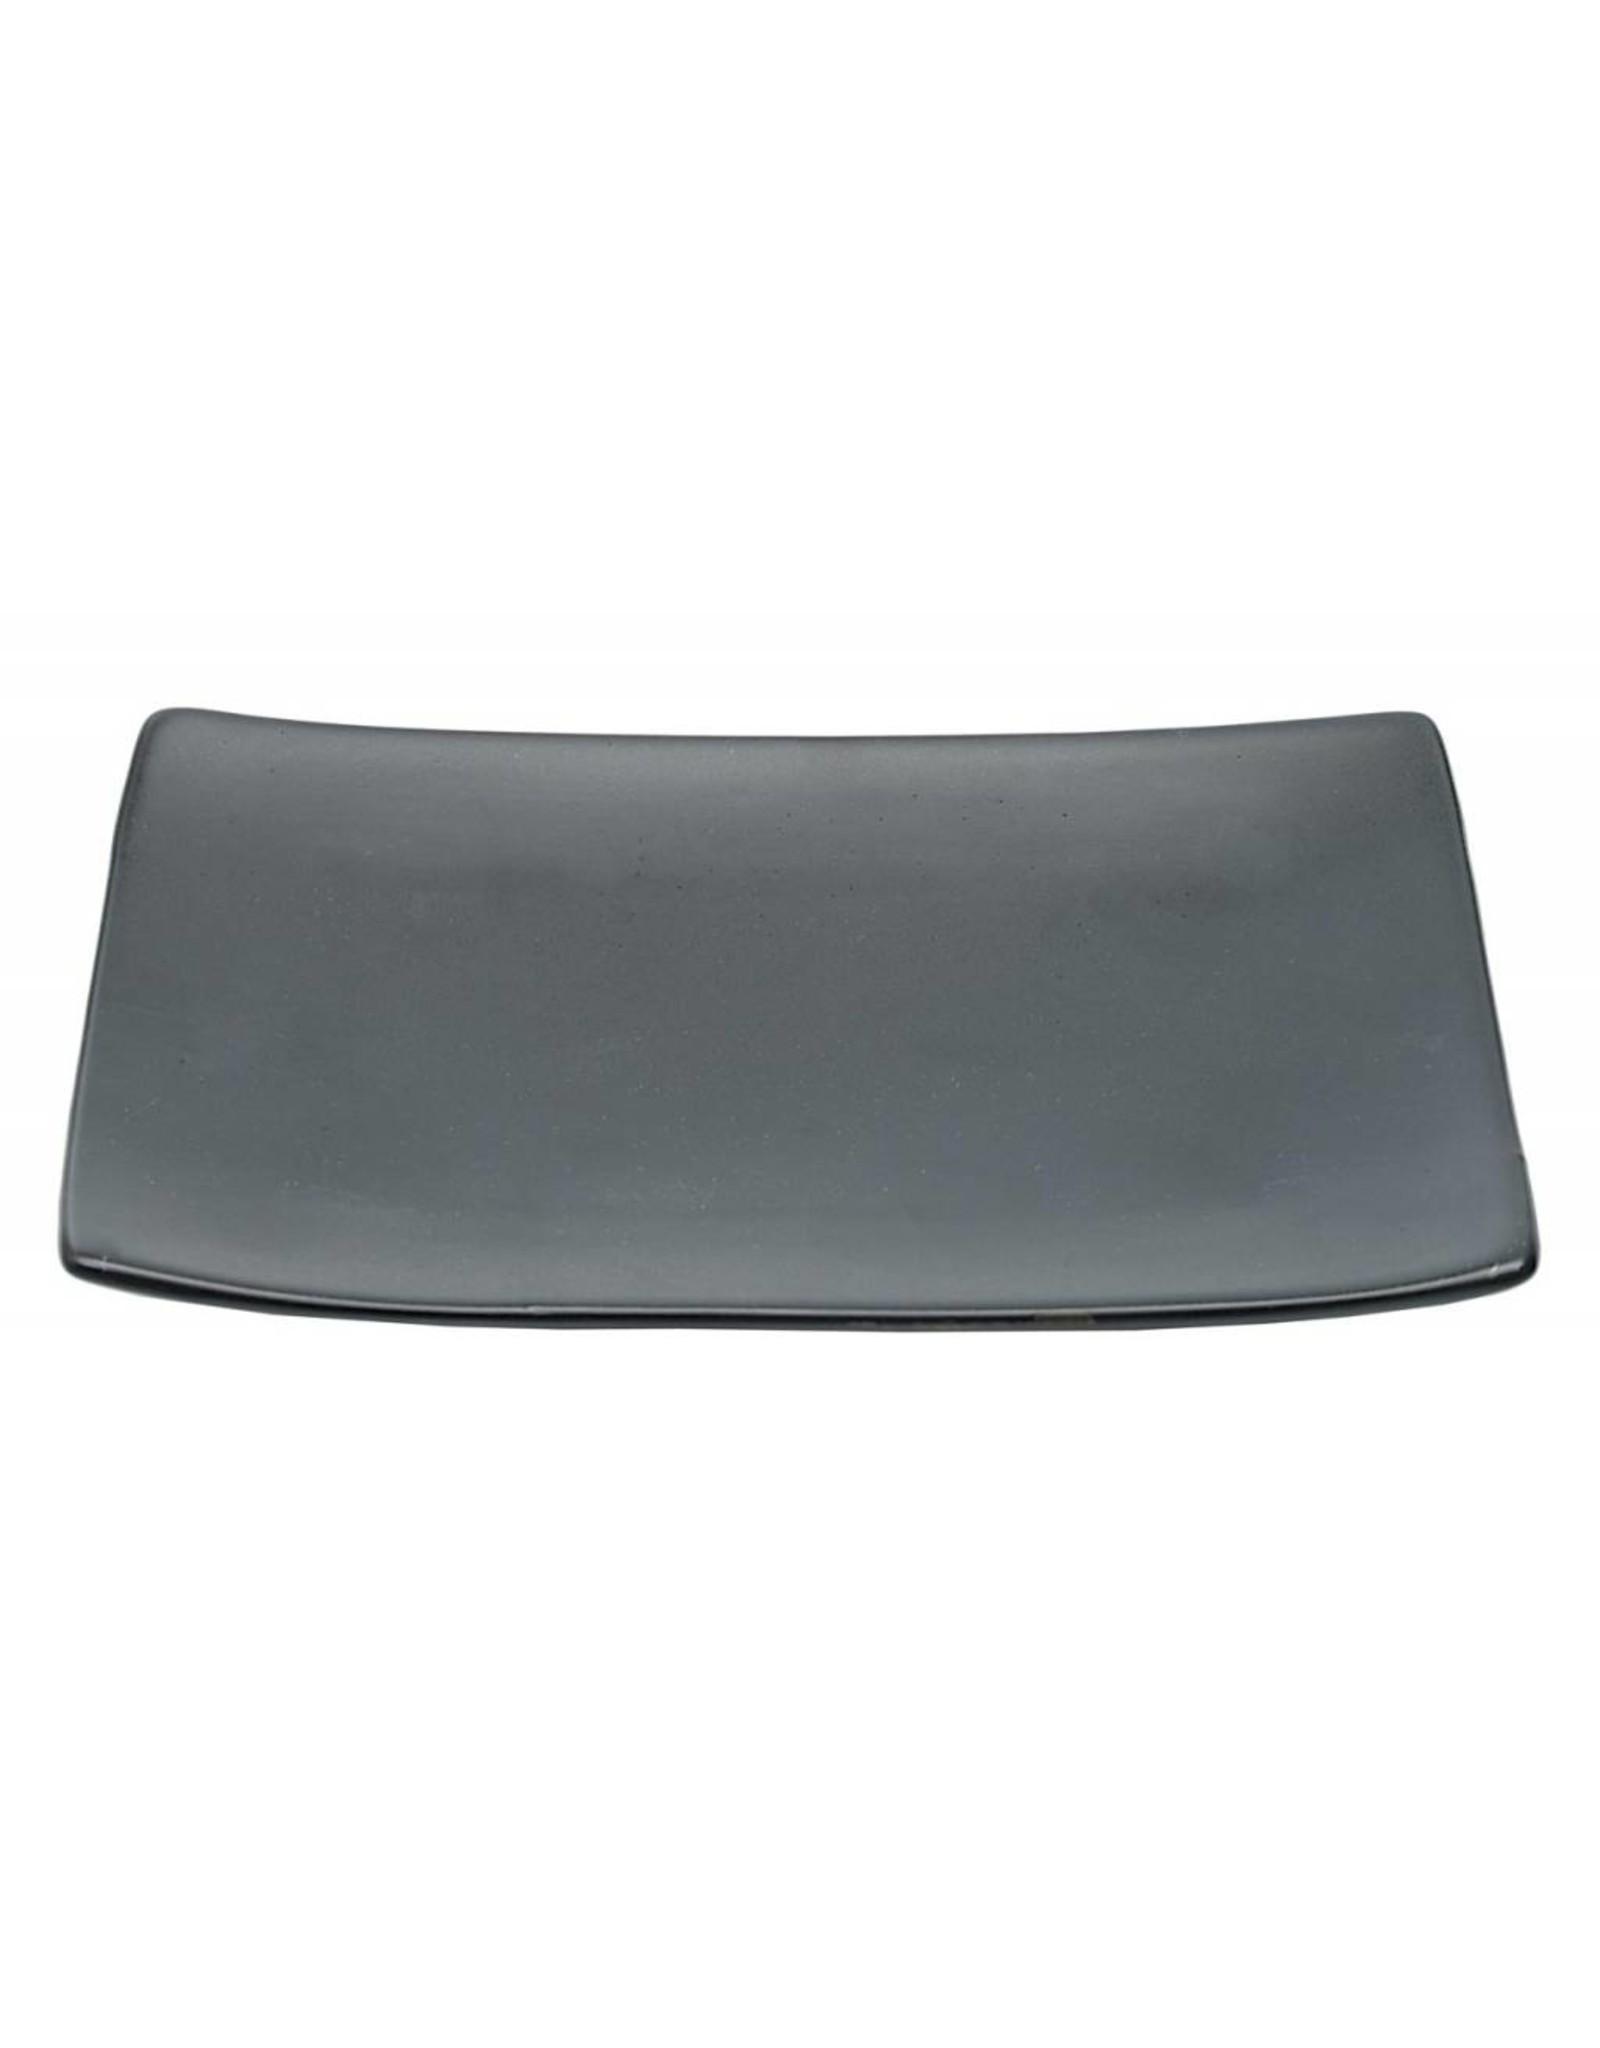 Tokyo Design Studio Black Series bord 20.5x13cm mat zwart